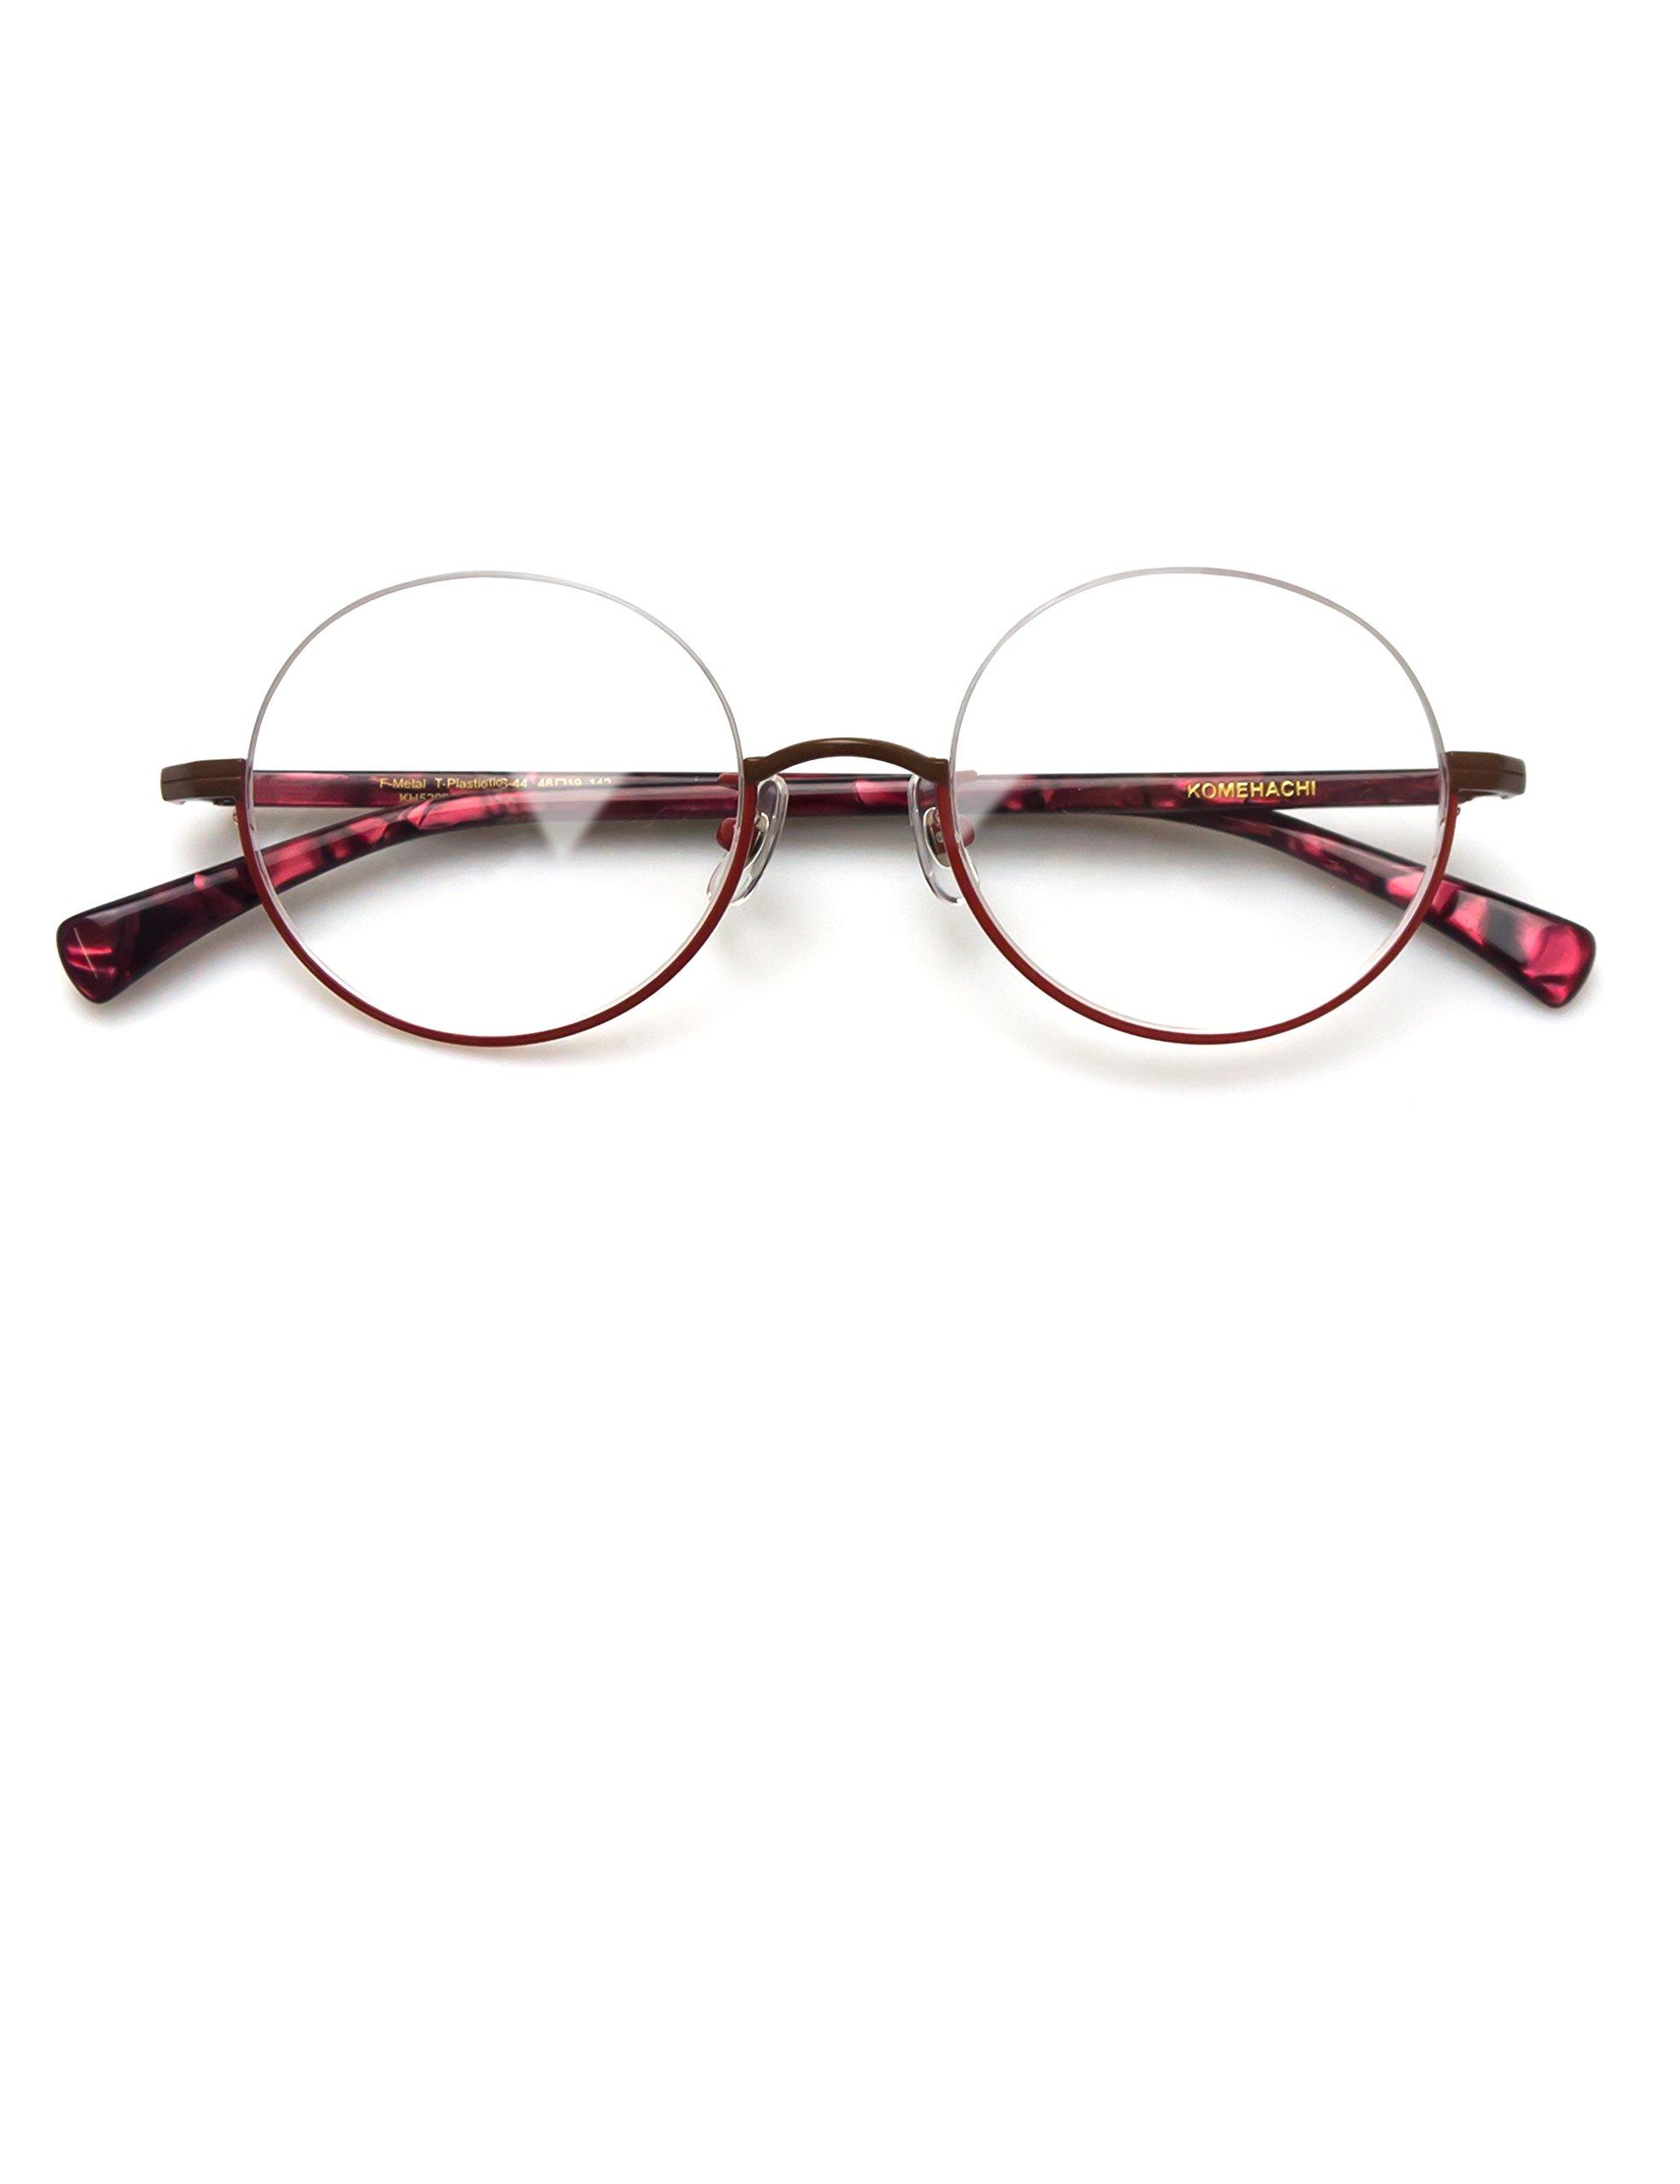 578c9b93722 Komehachi - Vintage Retro Round Under Semi Rimless Unisex Women Clear Lens  Eyeglasses Frames RX-Ready (Red)